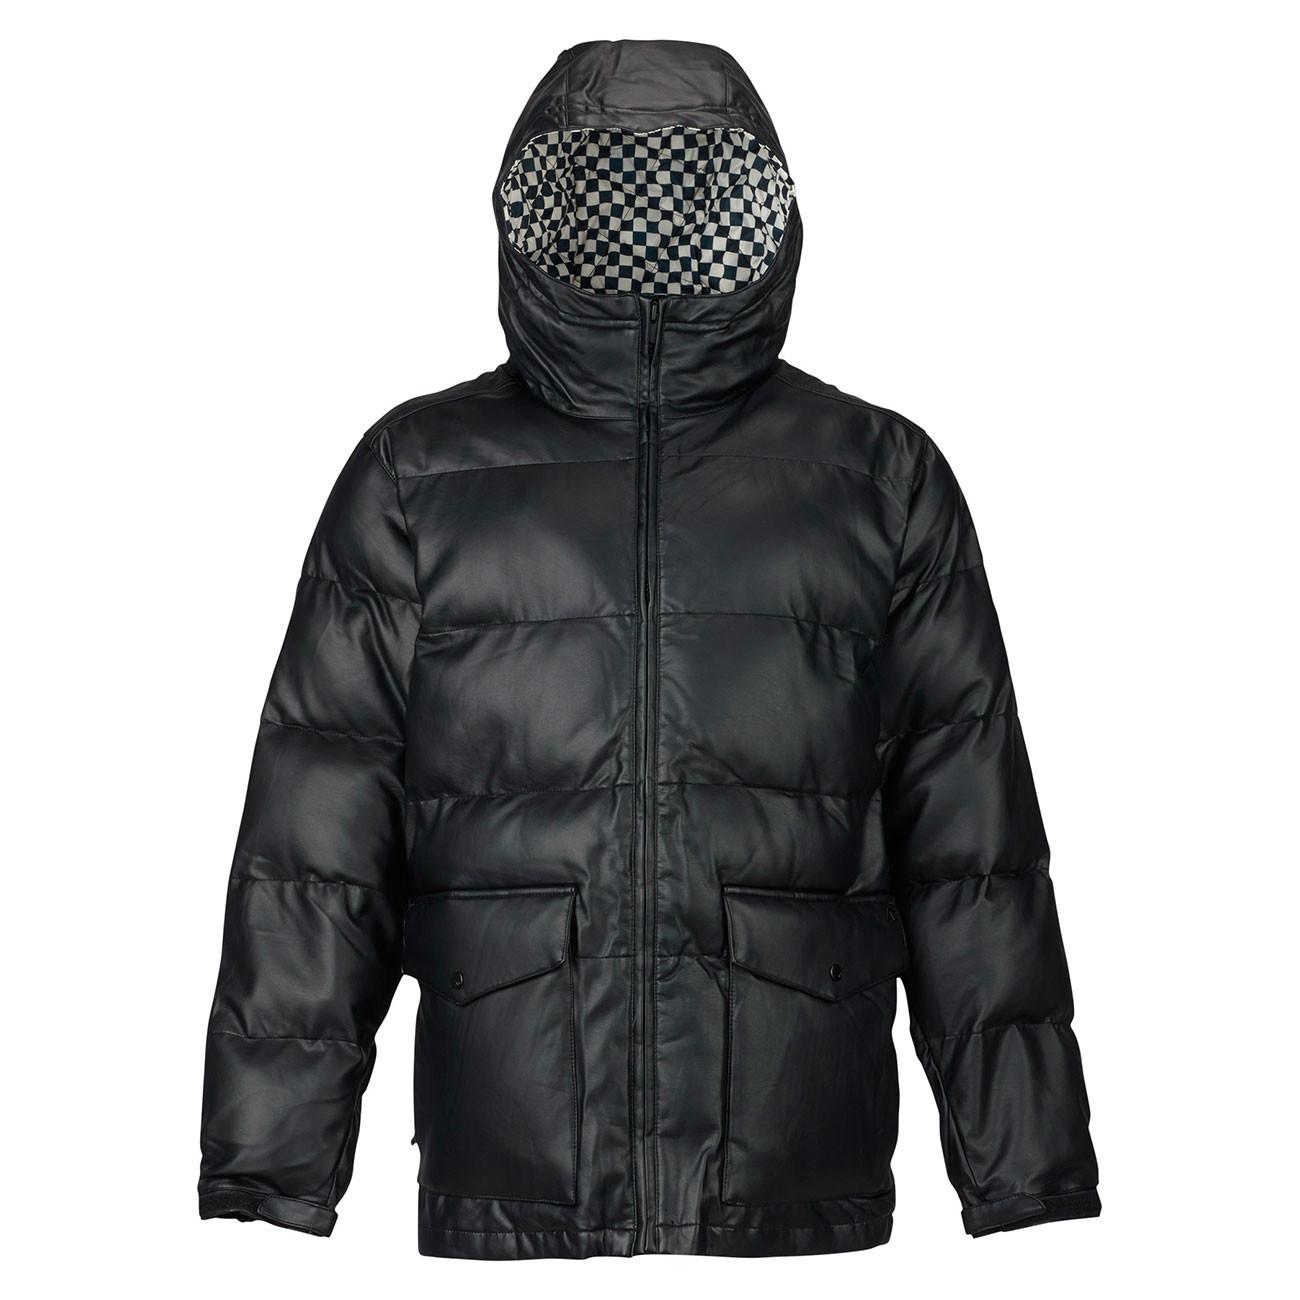 Bunda Analog Kilroy true black leather